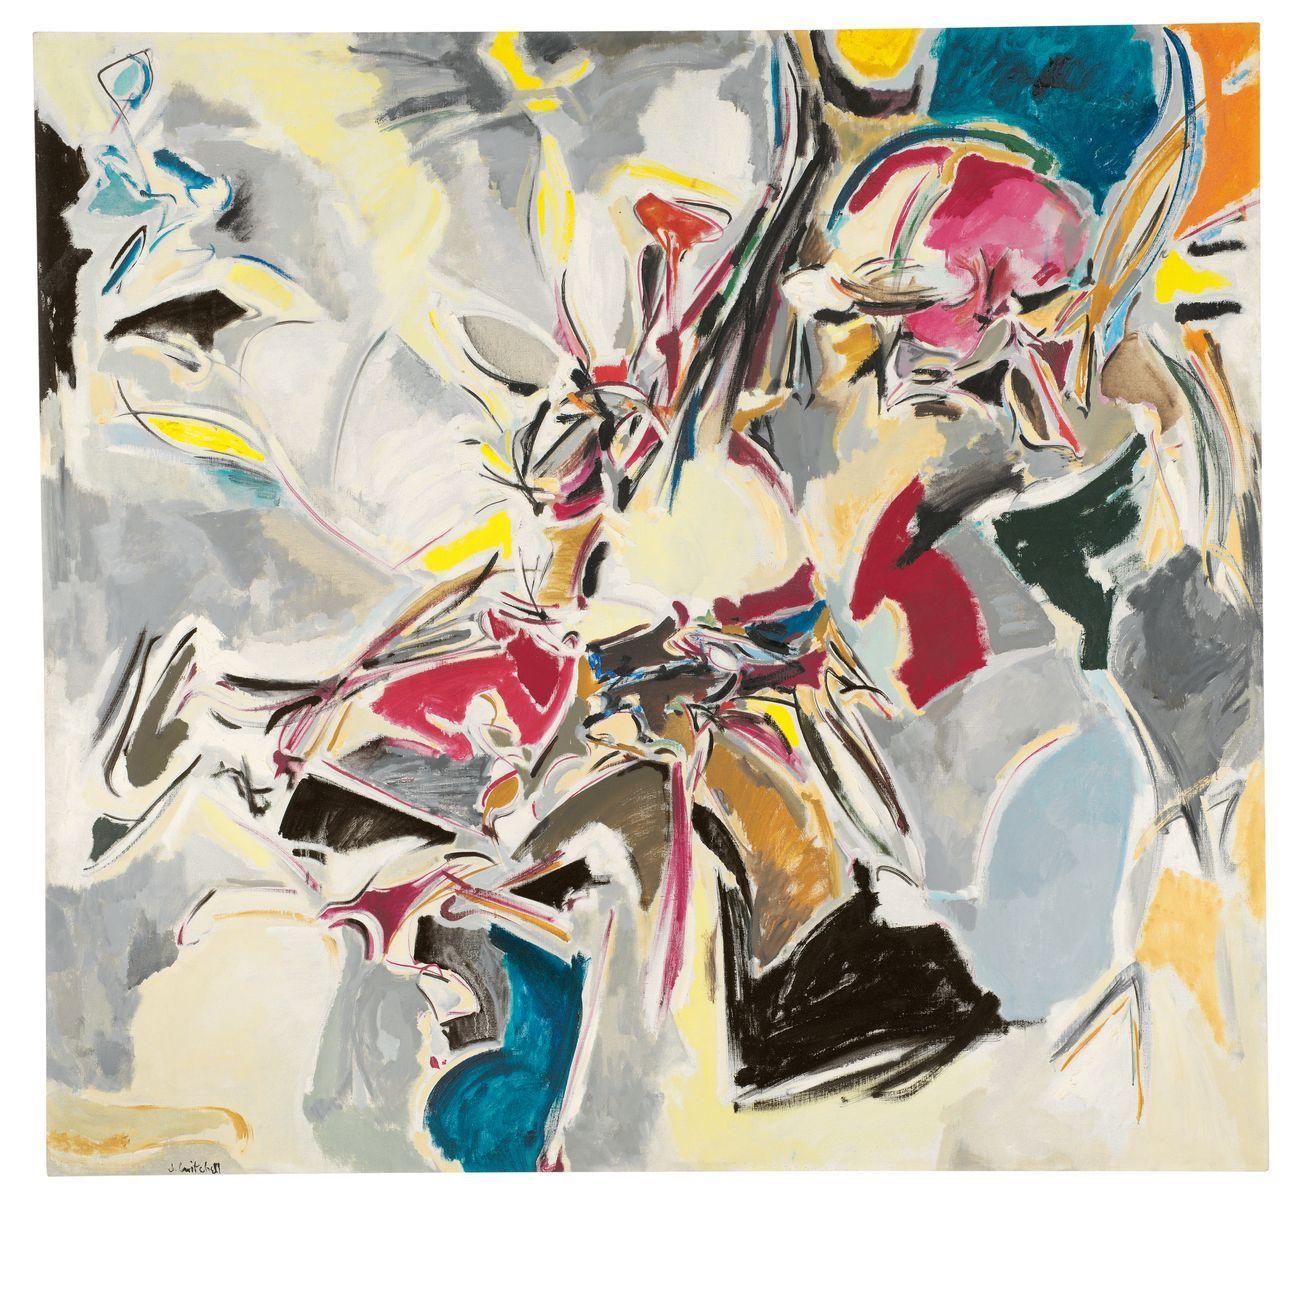 Joan Mitchell, Lyric, 1951 ca.. Frances Lehman Loeb Art Center, Vassar College, Poughkeepsie, New York, gift of William Rubin © Estate of Joan Mitchell. Photo Chip Porter